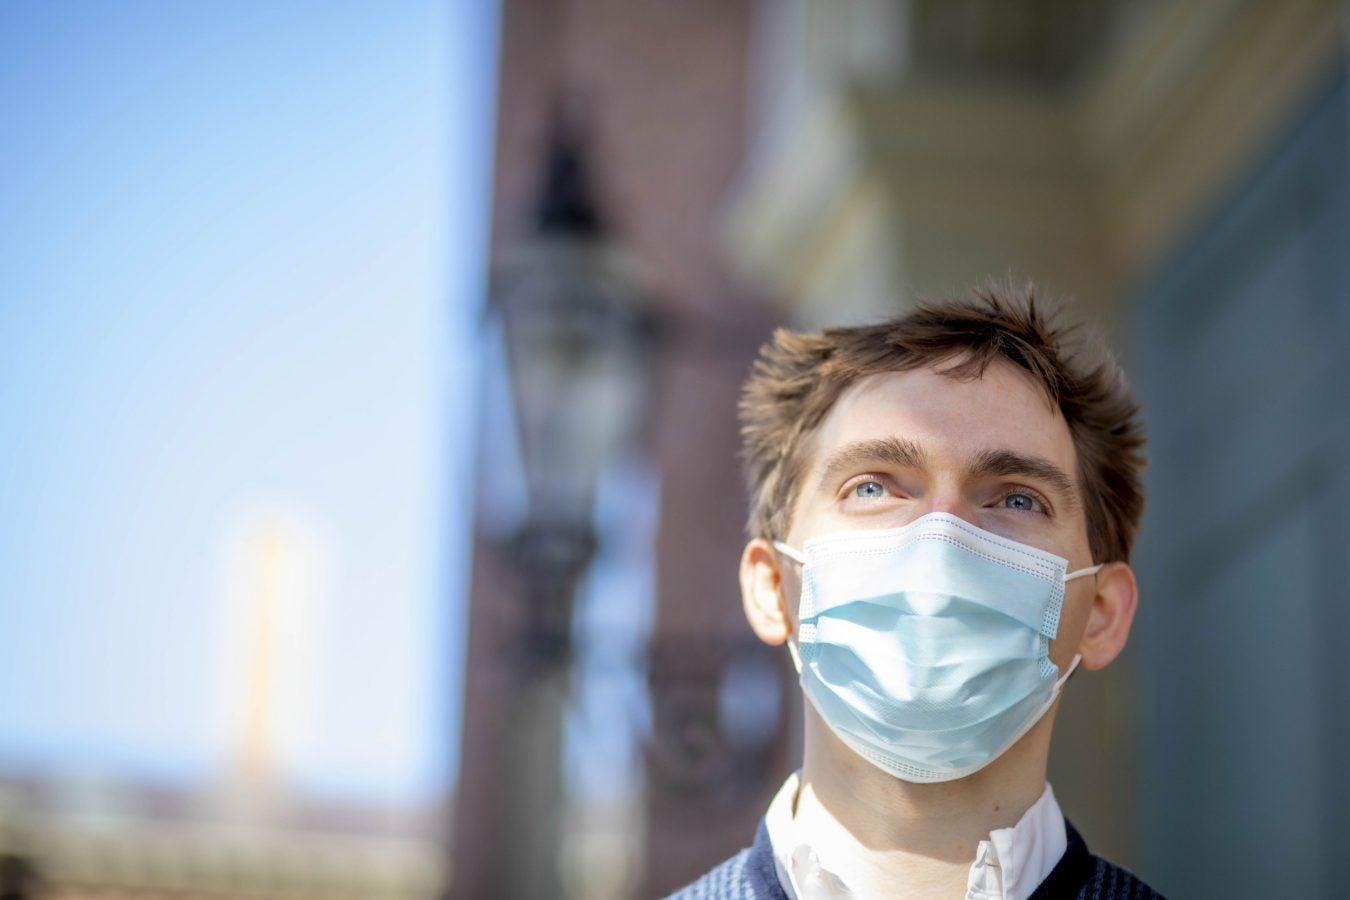 Harvard University Medical School student Grant Schleifer is pictured.